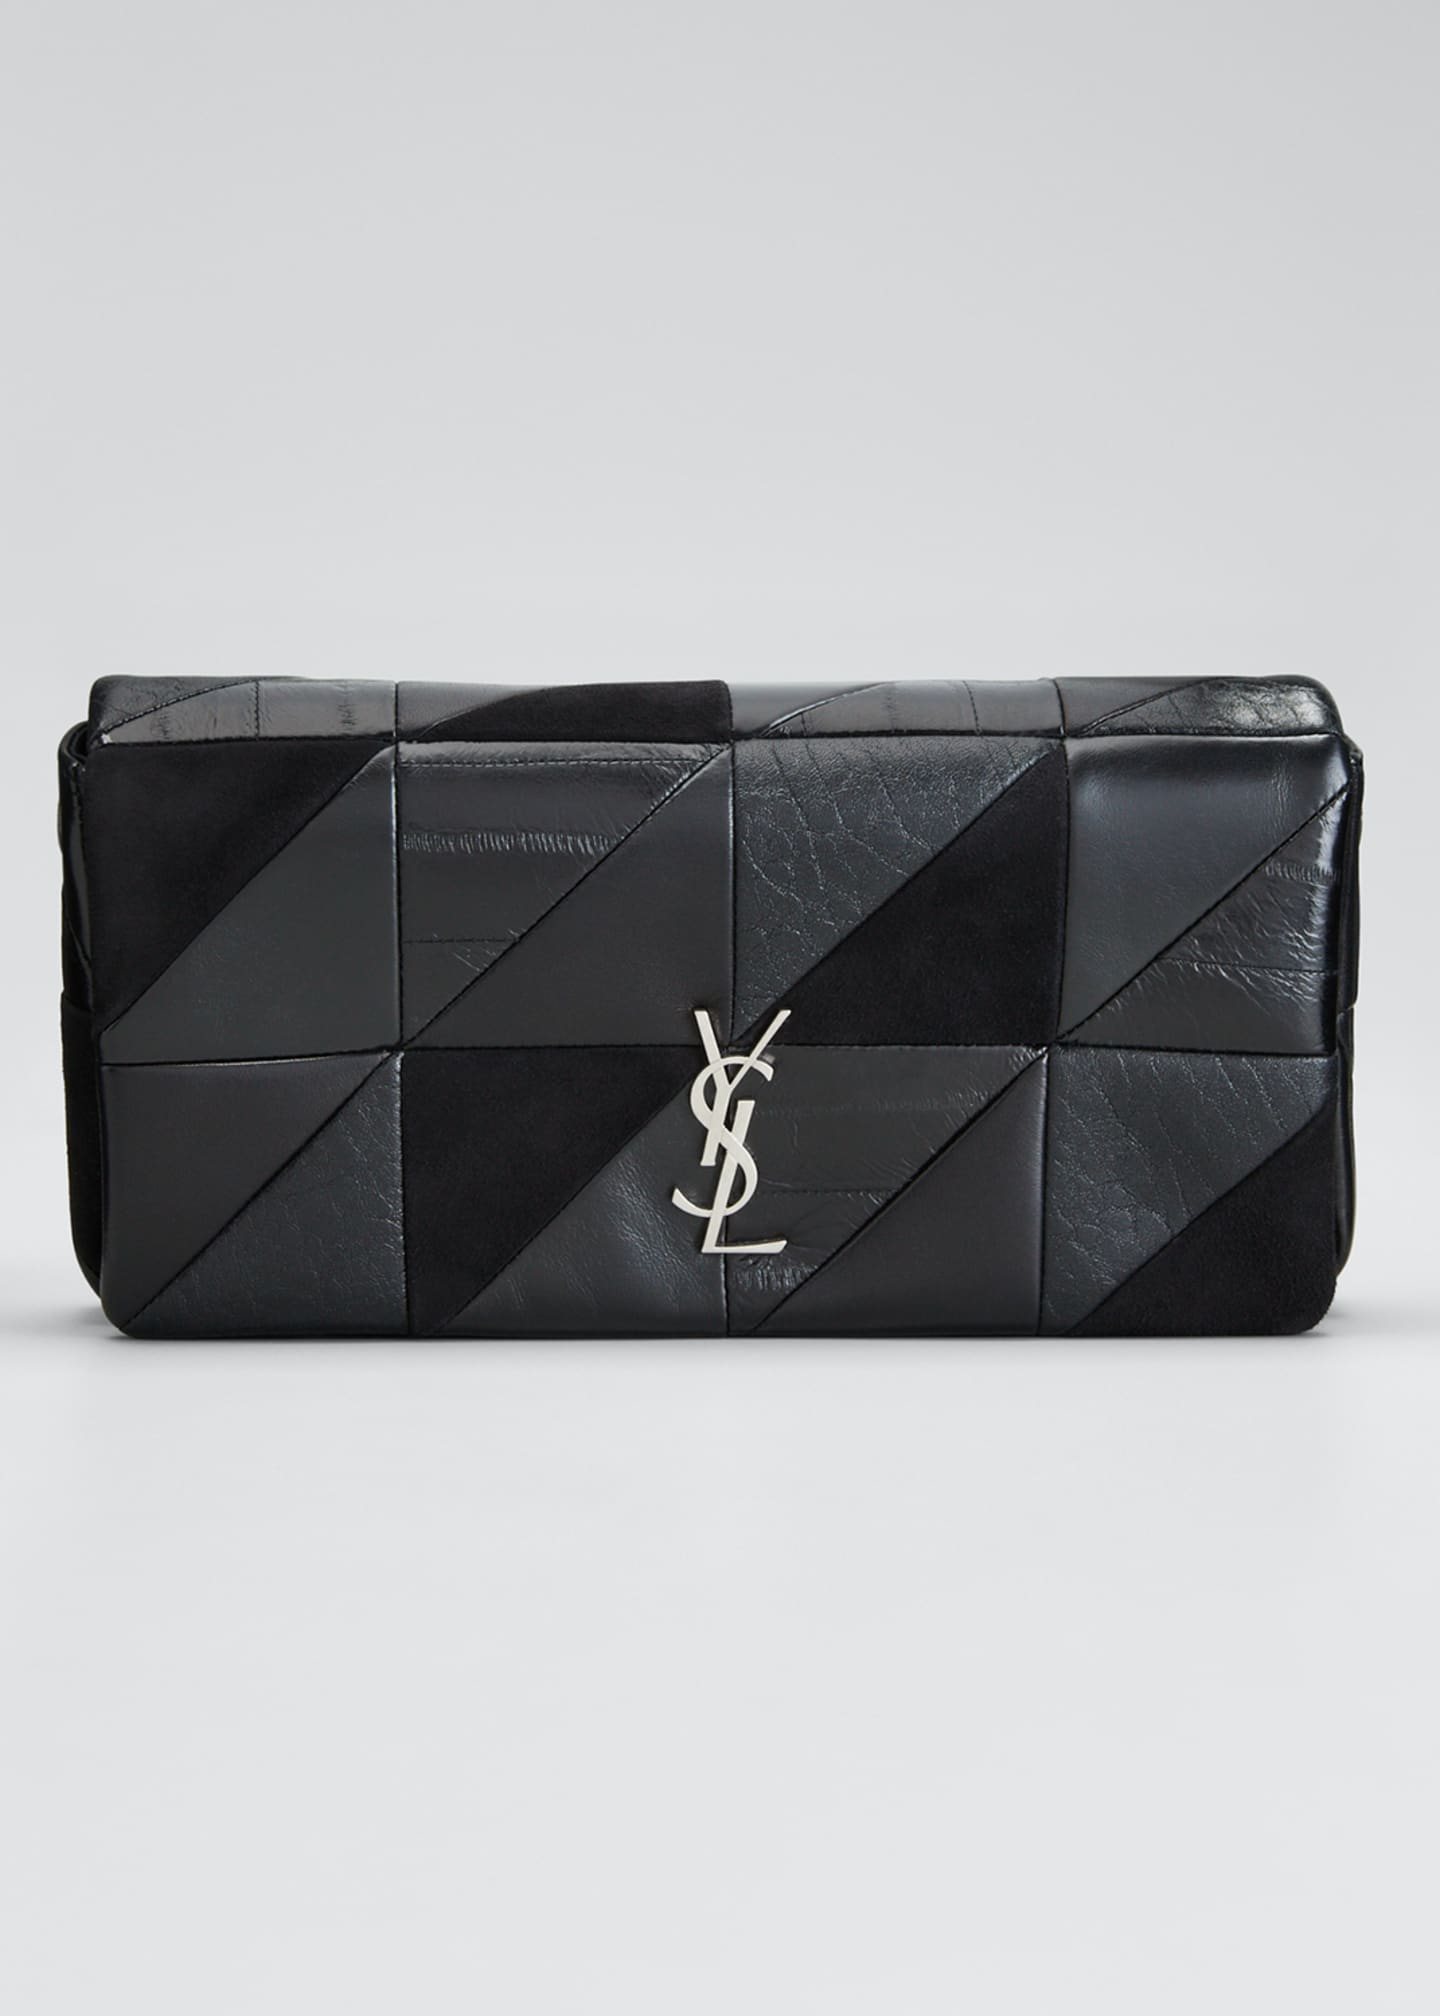 Saint Laurent Jamie YSL Monogram Patchwork Shoulder Bag